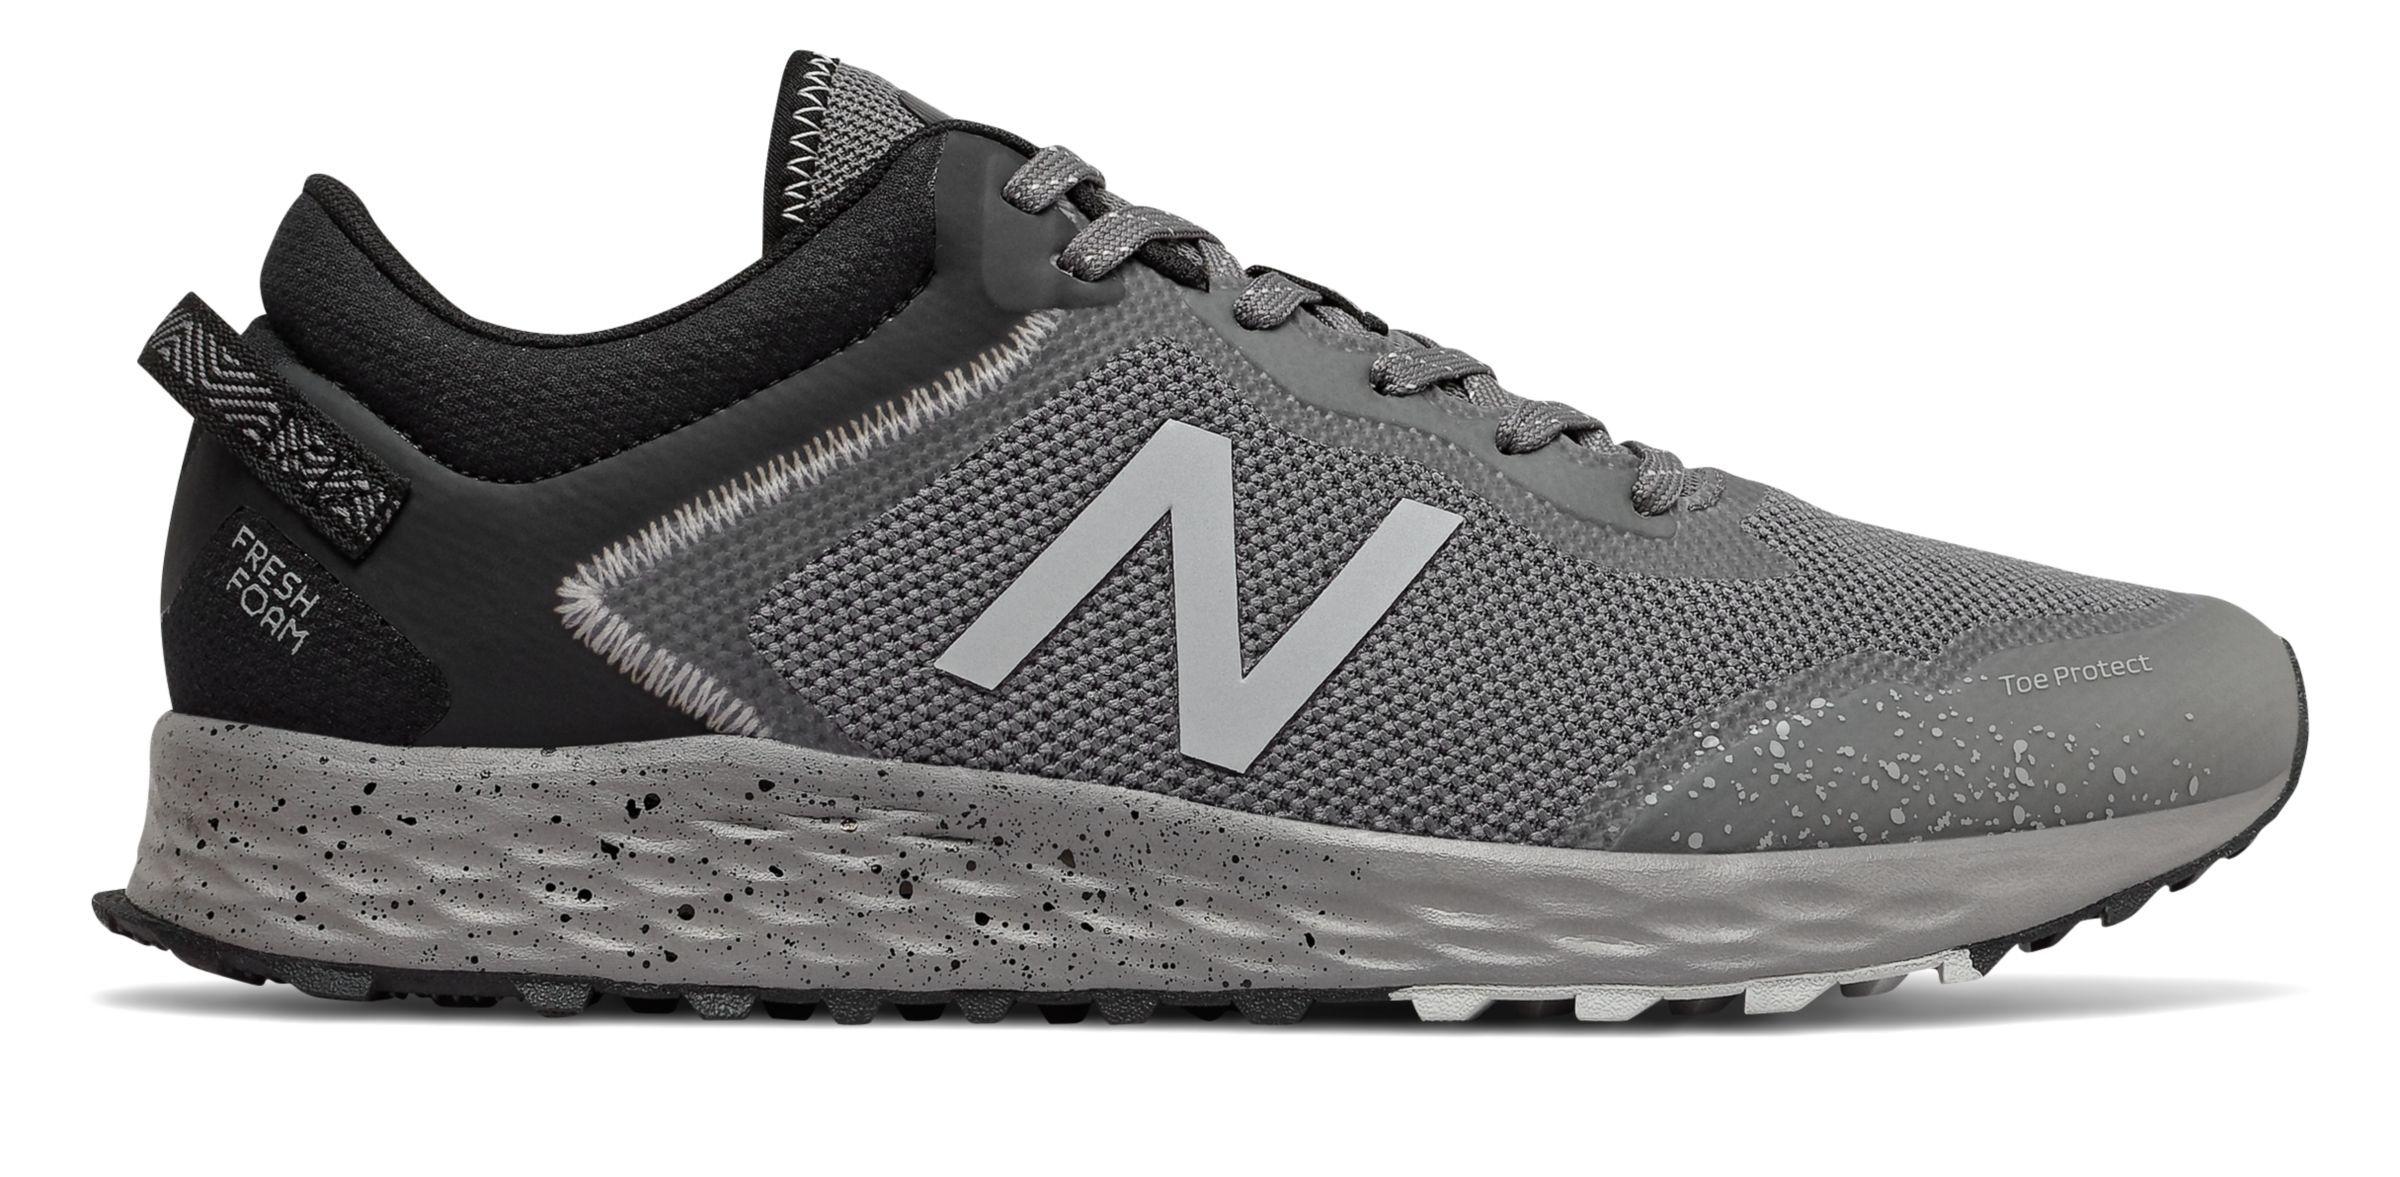 New Balance Men's Fresh Foam Arishi Trail Shoes Grey with Grey & Grey  - Grey with Grey & Grey - Size: 8